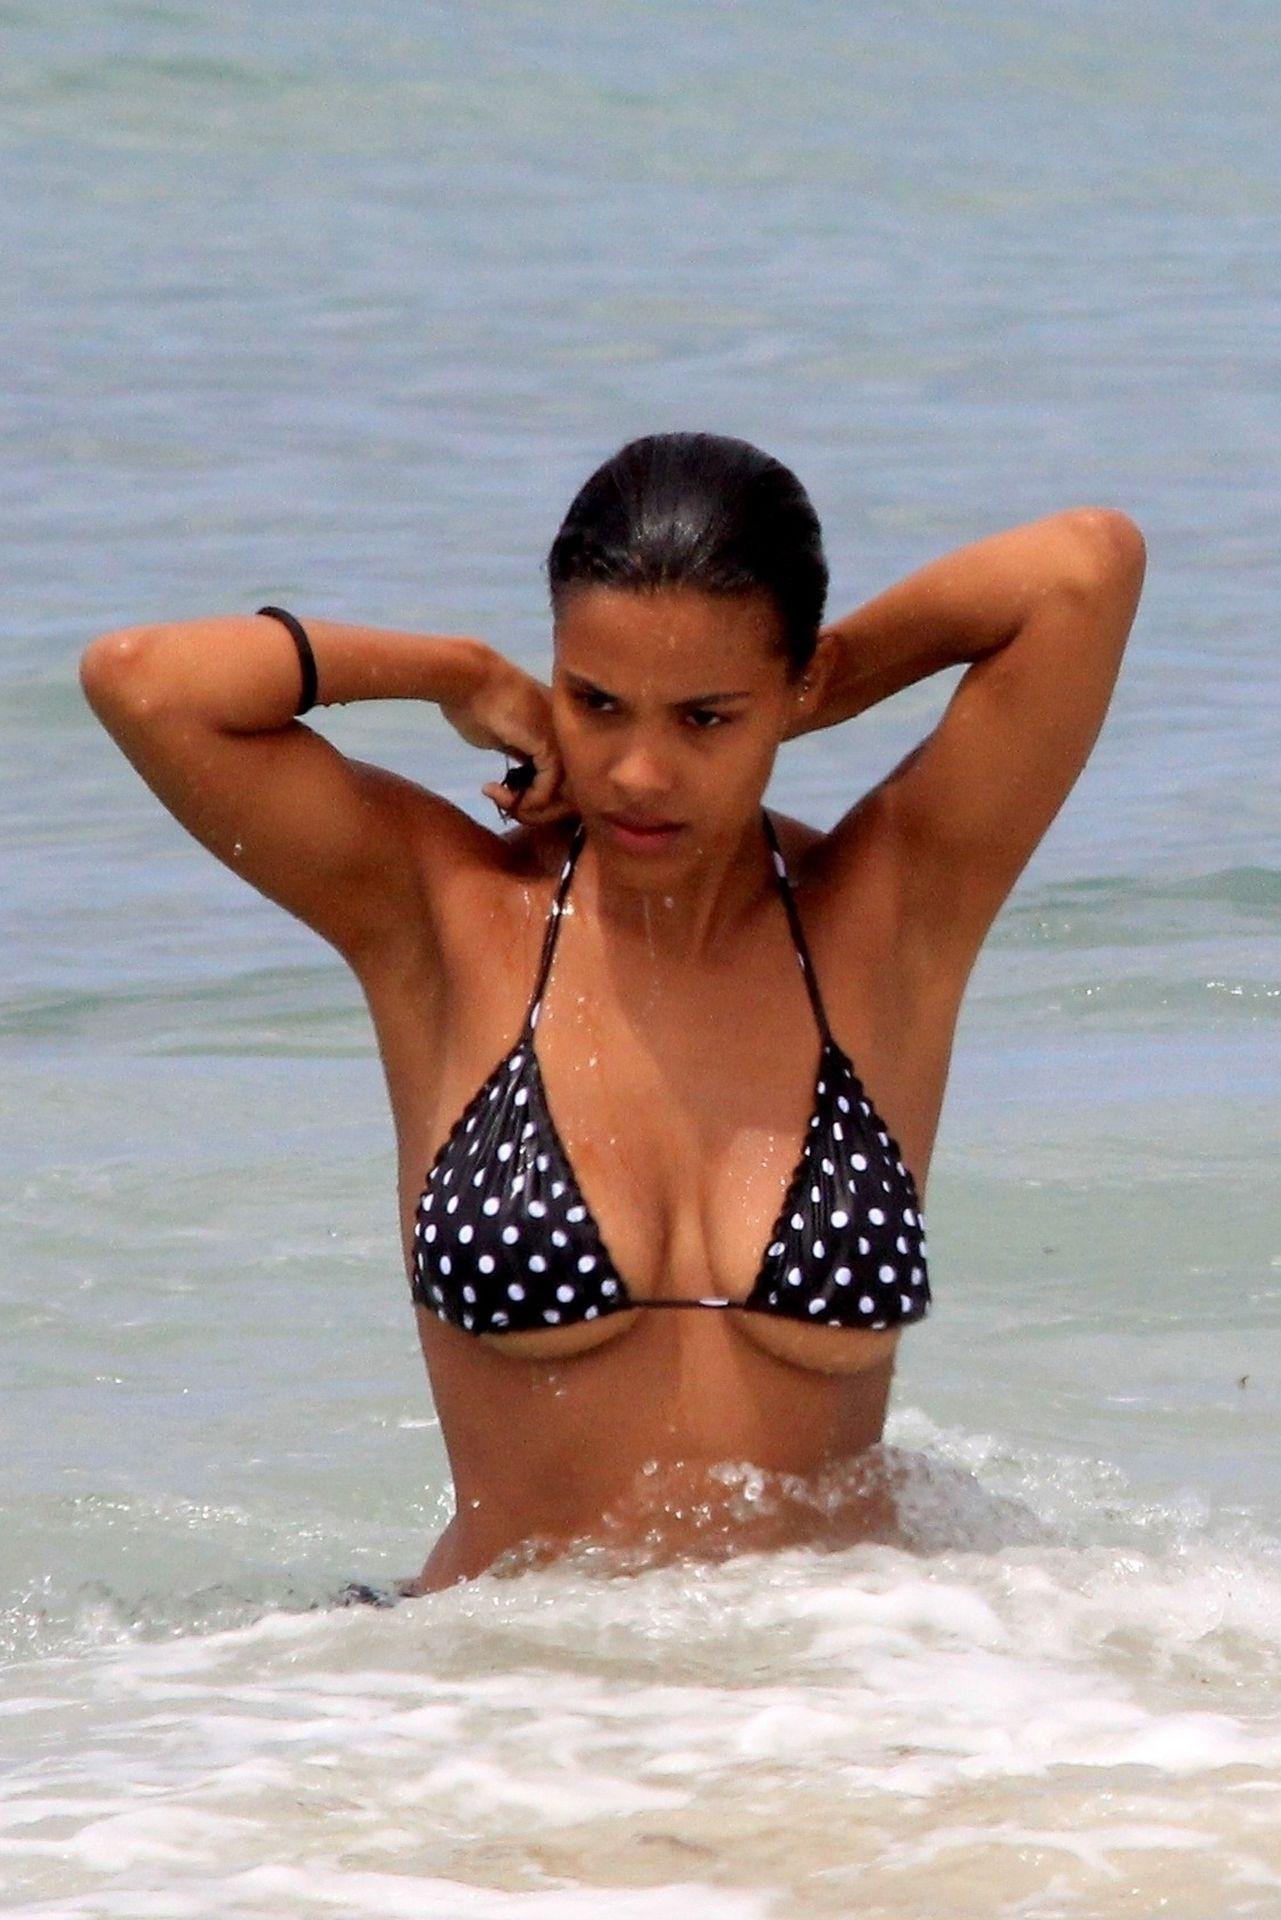 Tina Kunakey Nearly Nip Slip While Frolicking On The Beach In Rio 0044